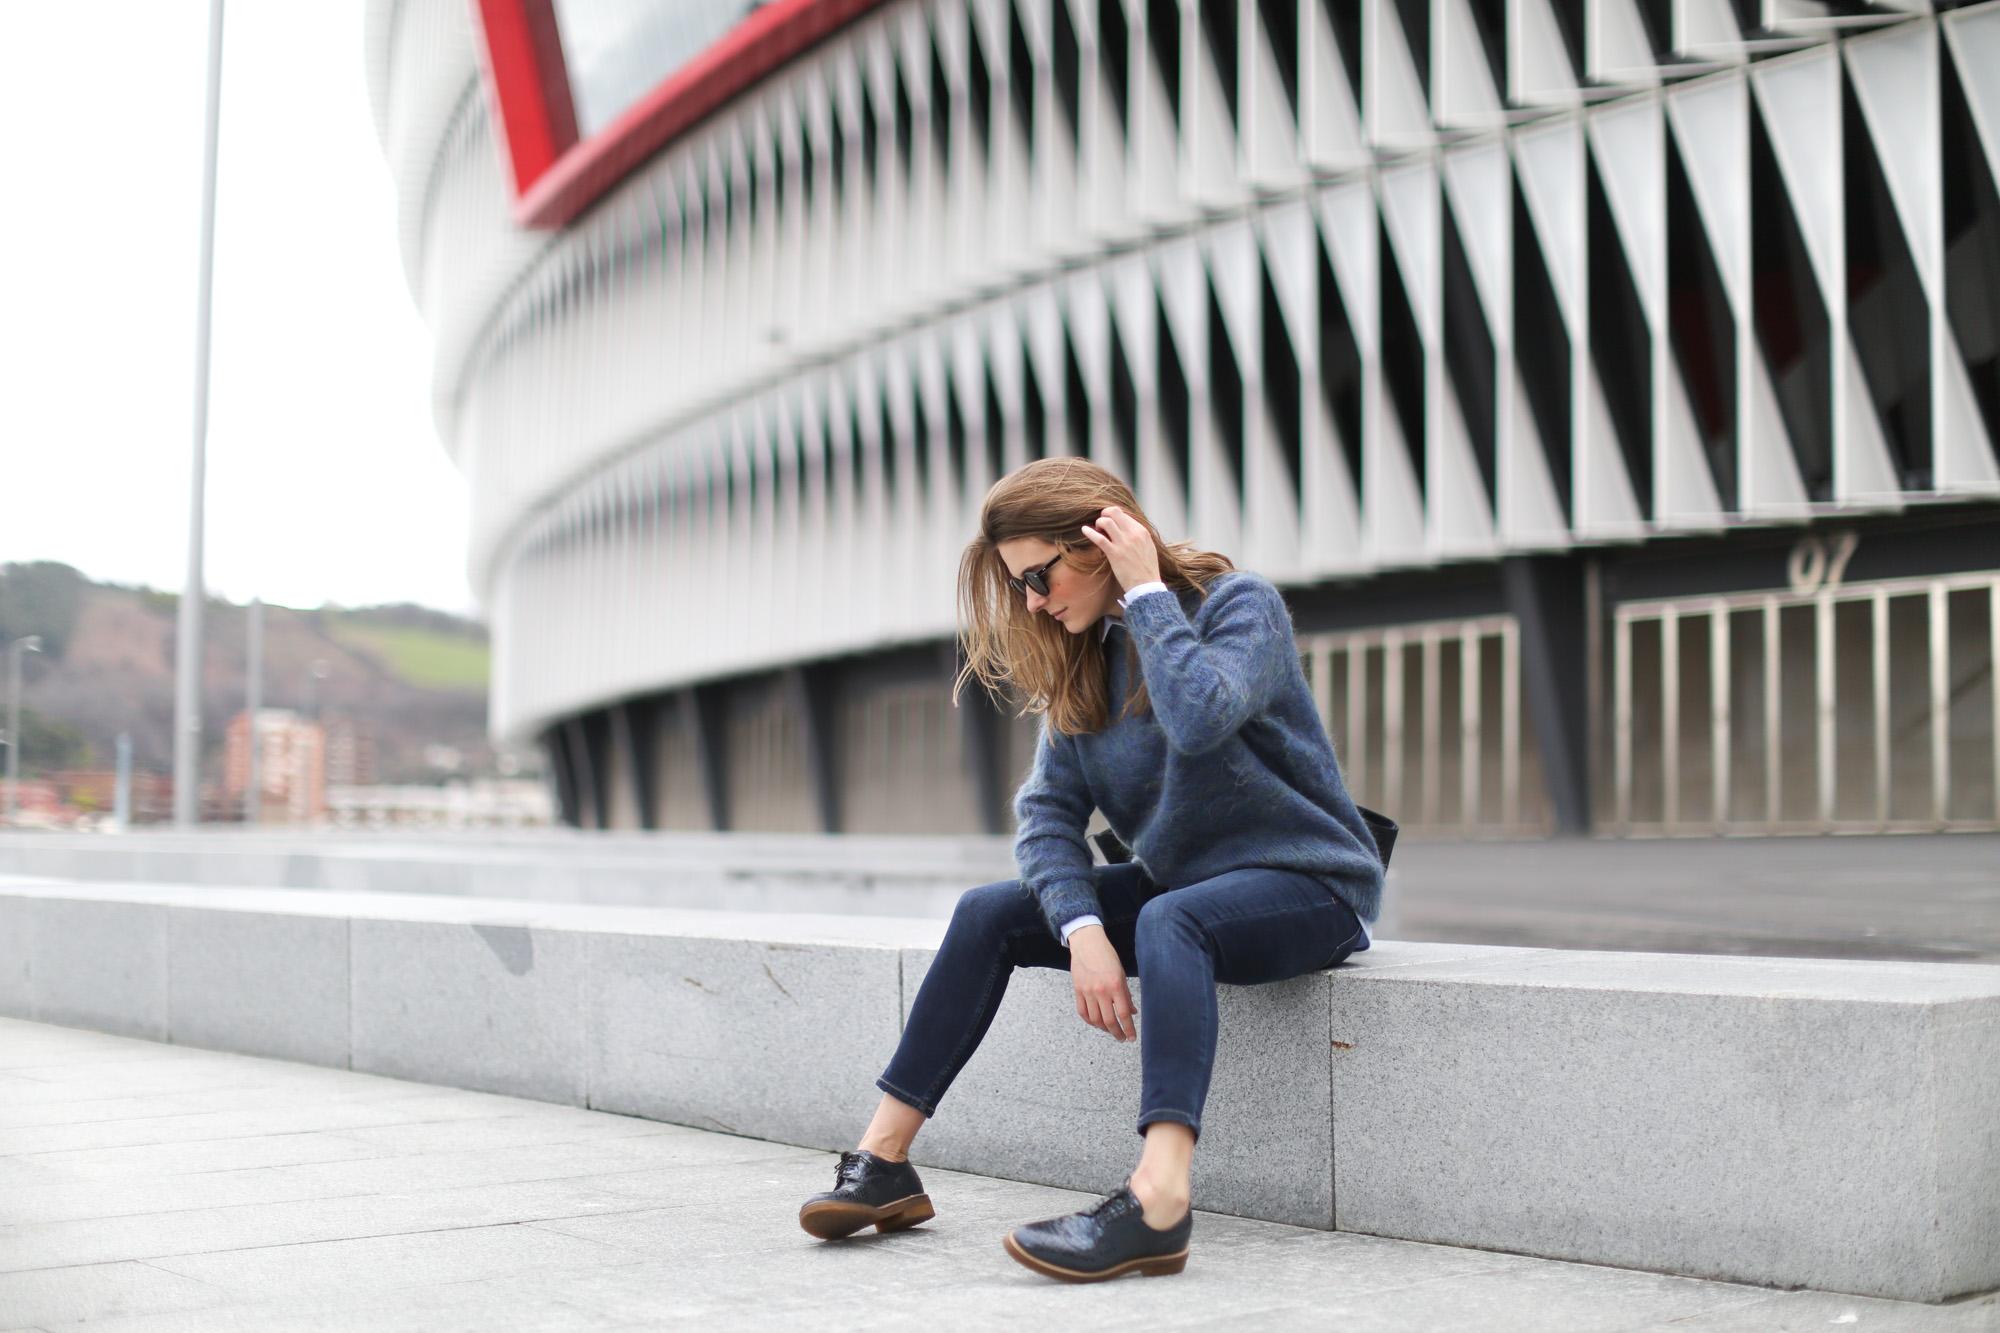 Clochet-streetstyle-bimbaylola-blue-knit-topshop-baxter-jeans-sushibag-13